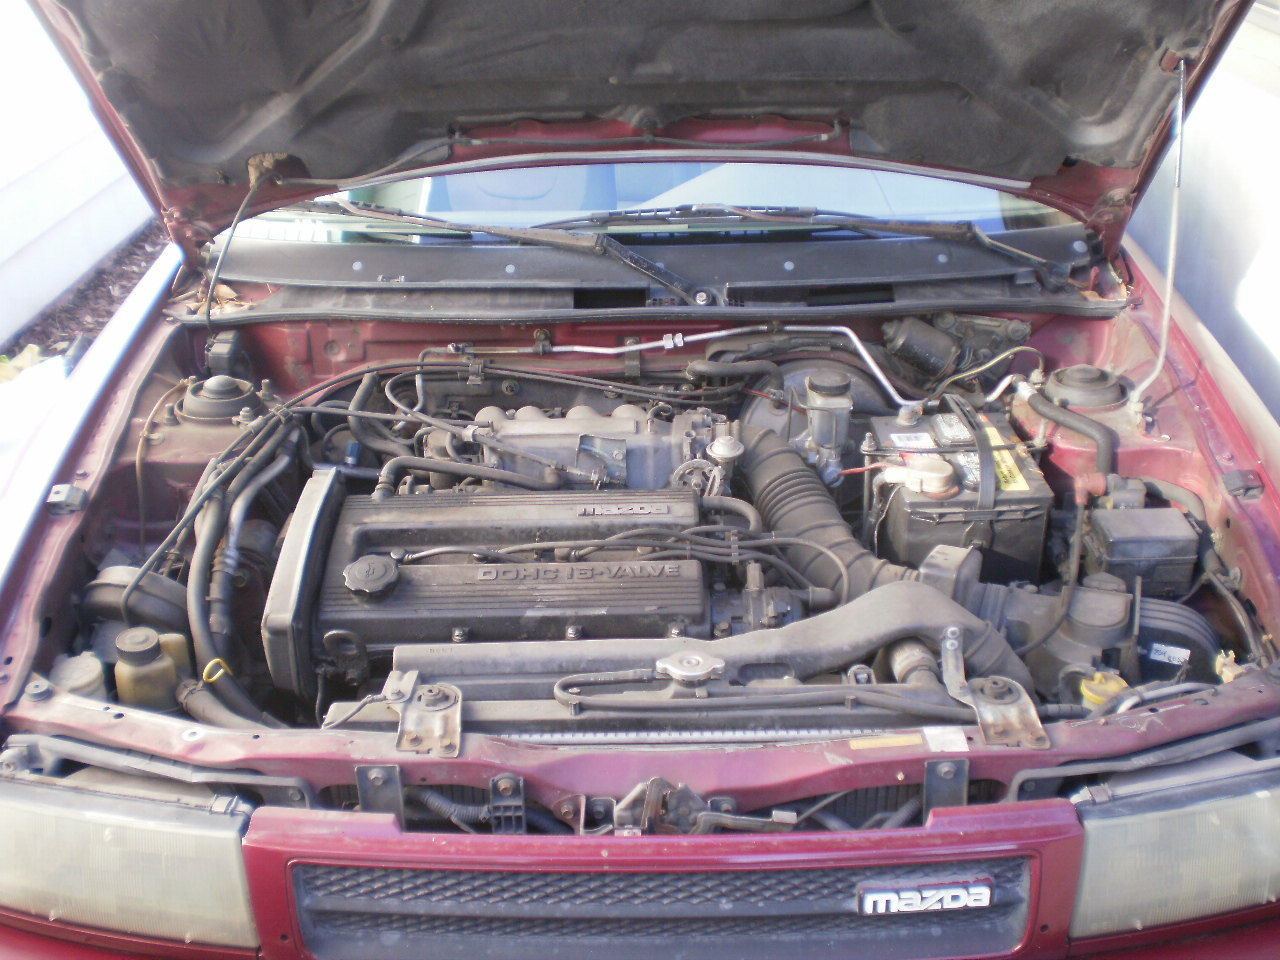 red 1992 mazda protege lx dohc 323 original engine new tires brakes alternator classic mazda protege 1992 for sale smclassiccars com